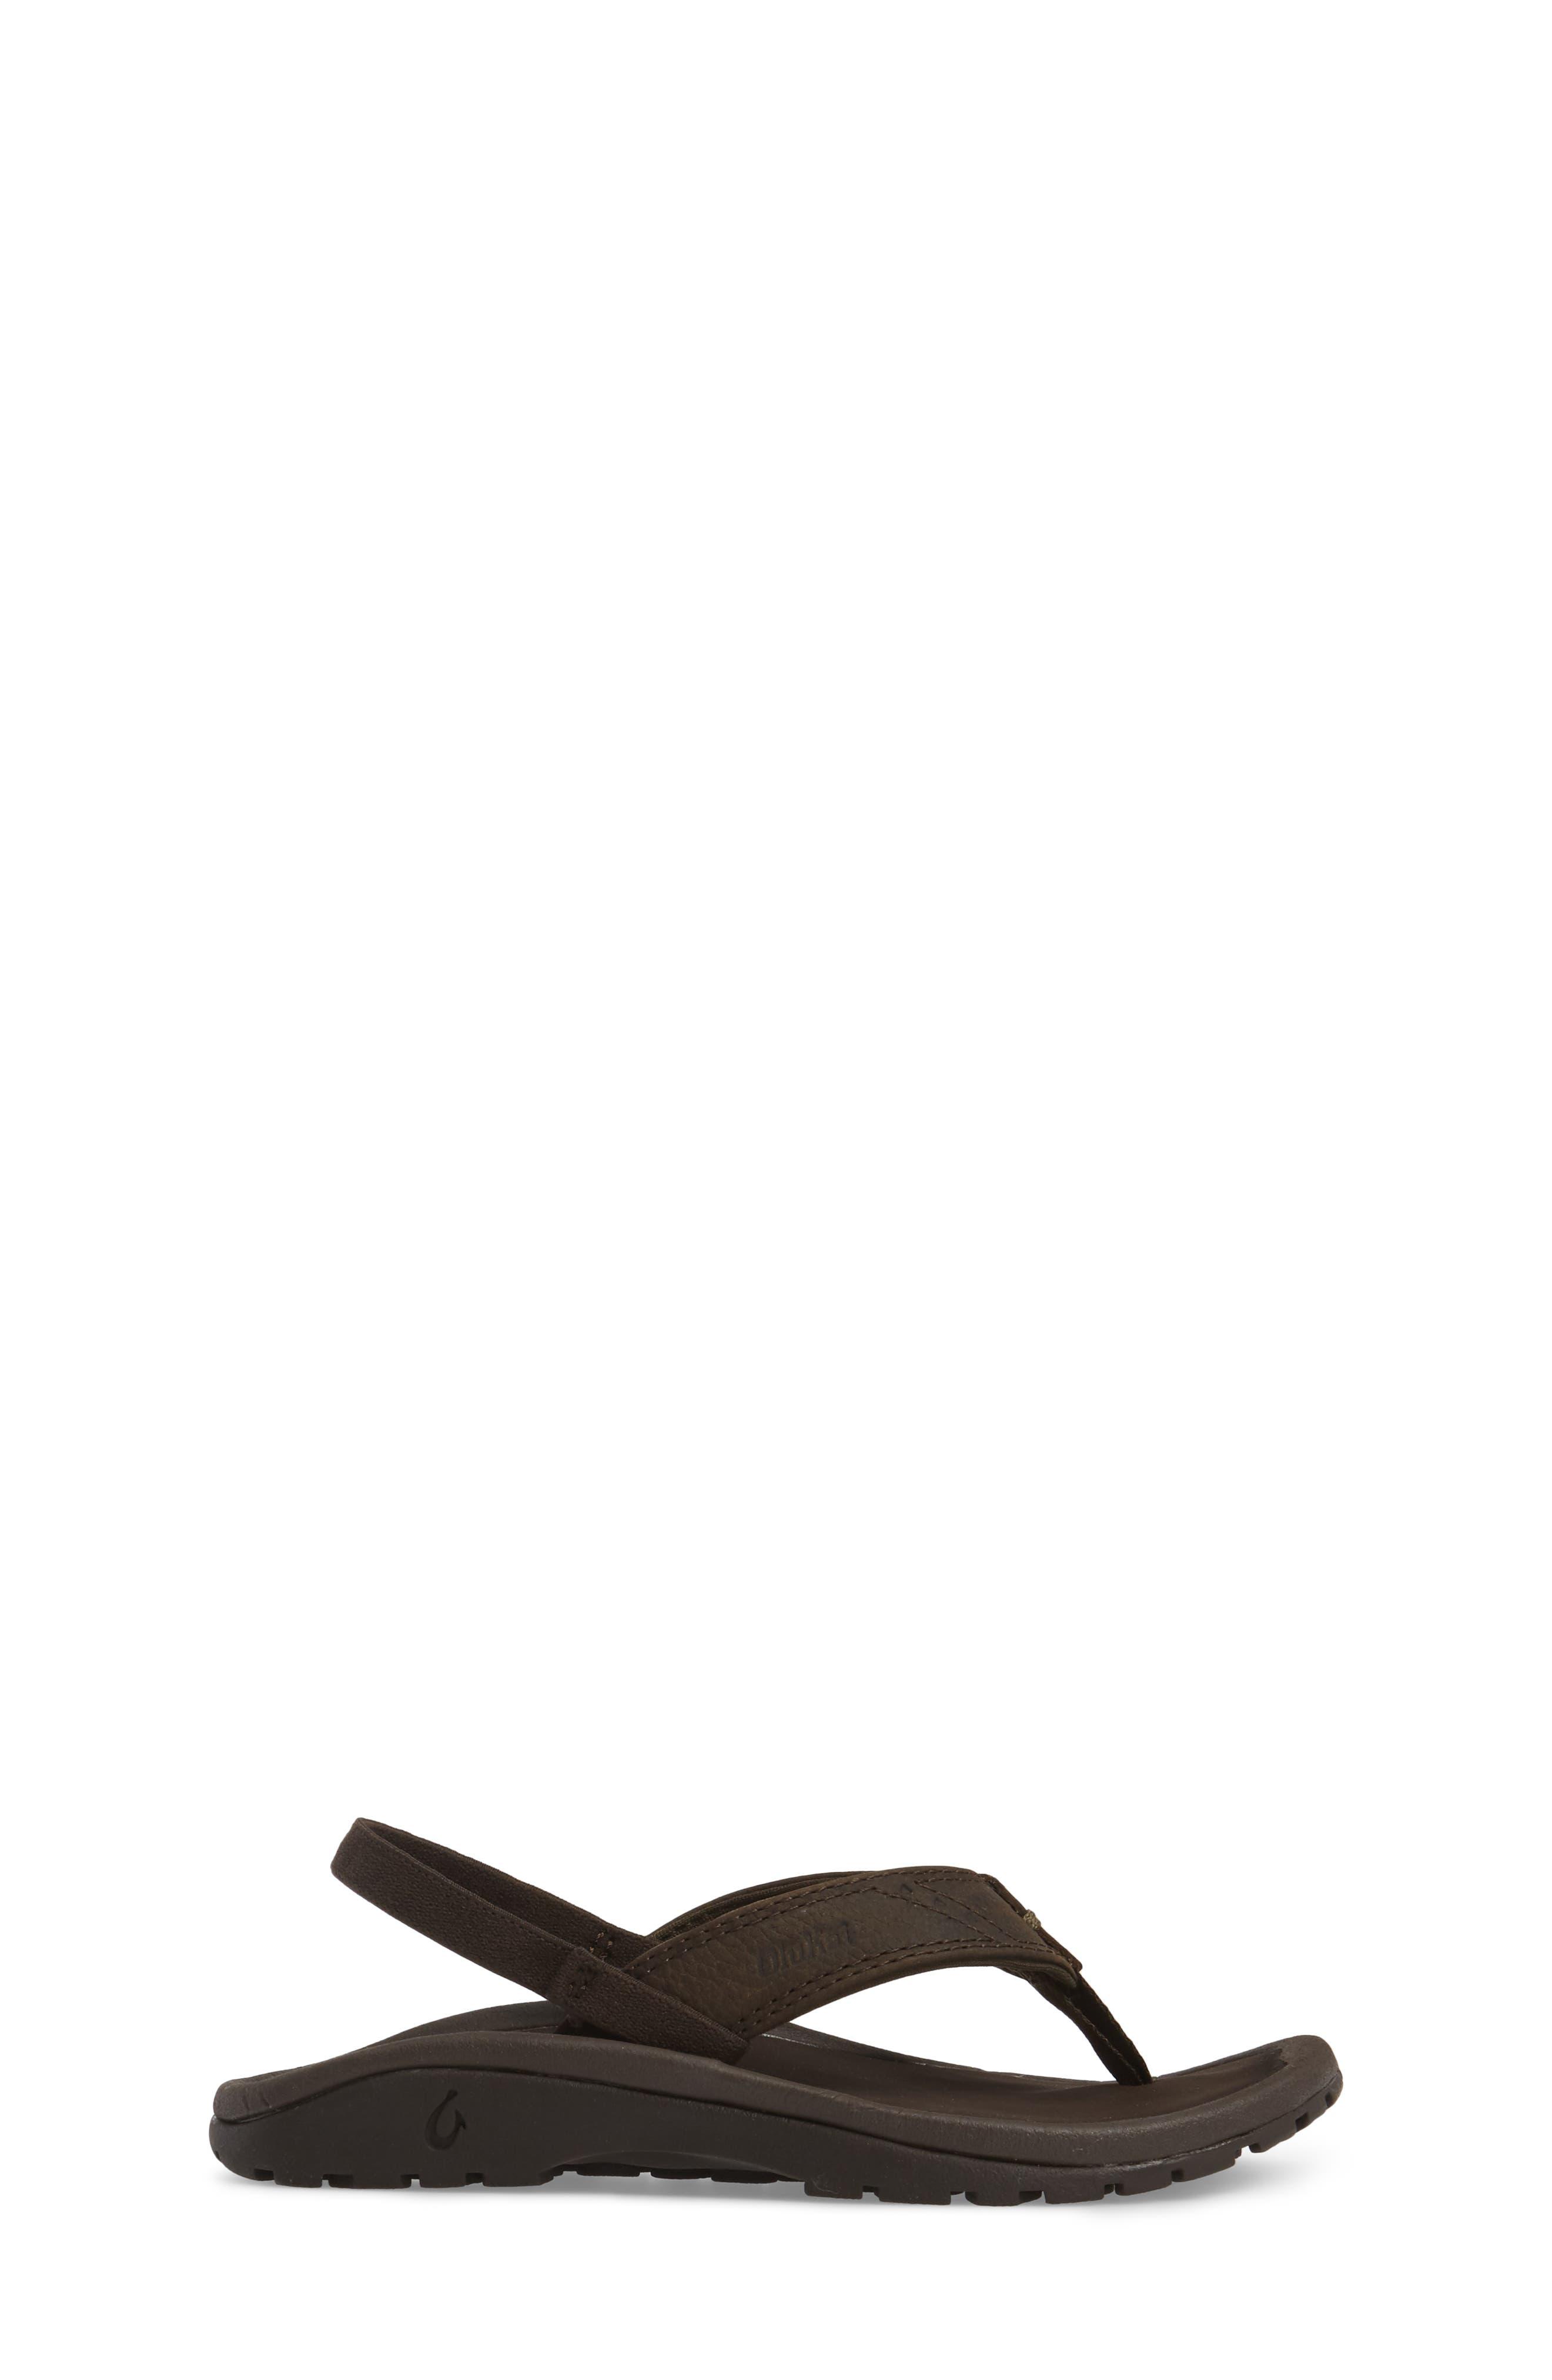 OLUKAI,                             Nui Leather Sandal,                             Alternate thumbnail 3, color,                             SEAL BROWN/ DARK JAVA